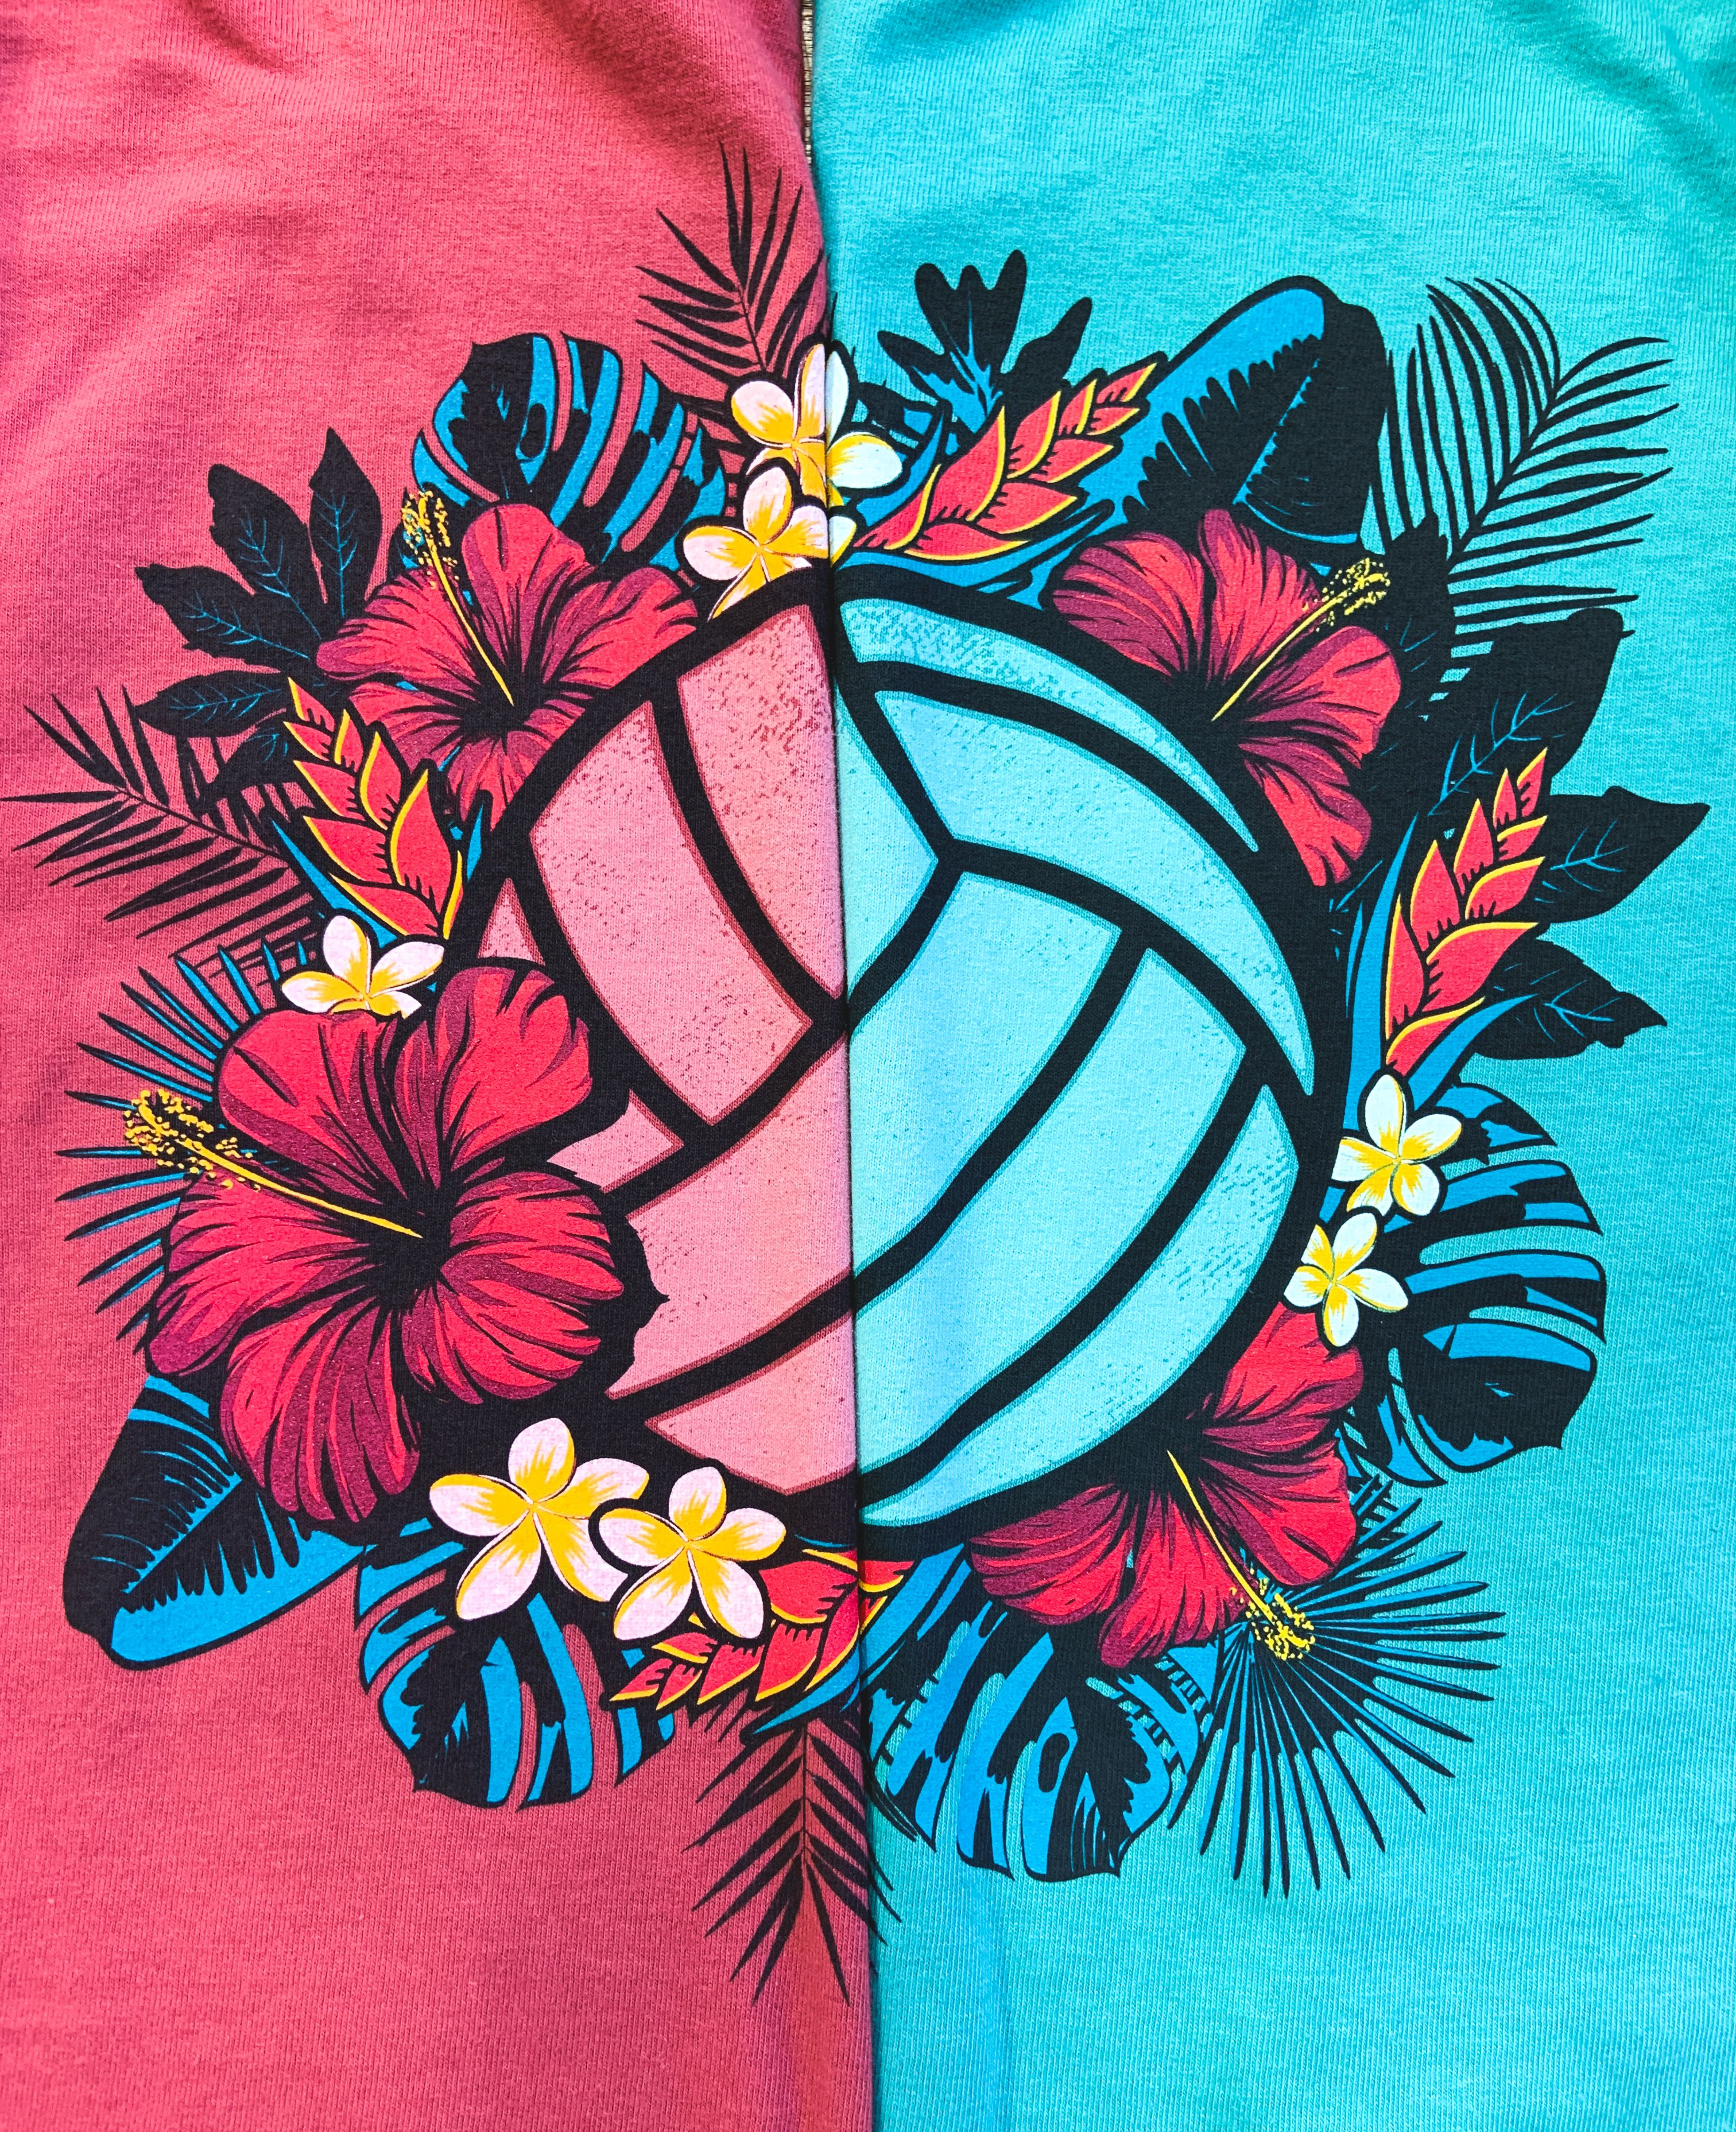 Kona Volleyball Shirt Designs Volleyball Shirts Volleyball Sweatshirts